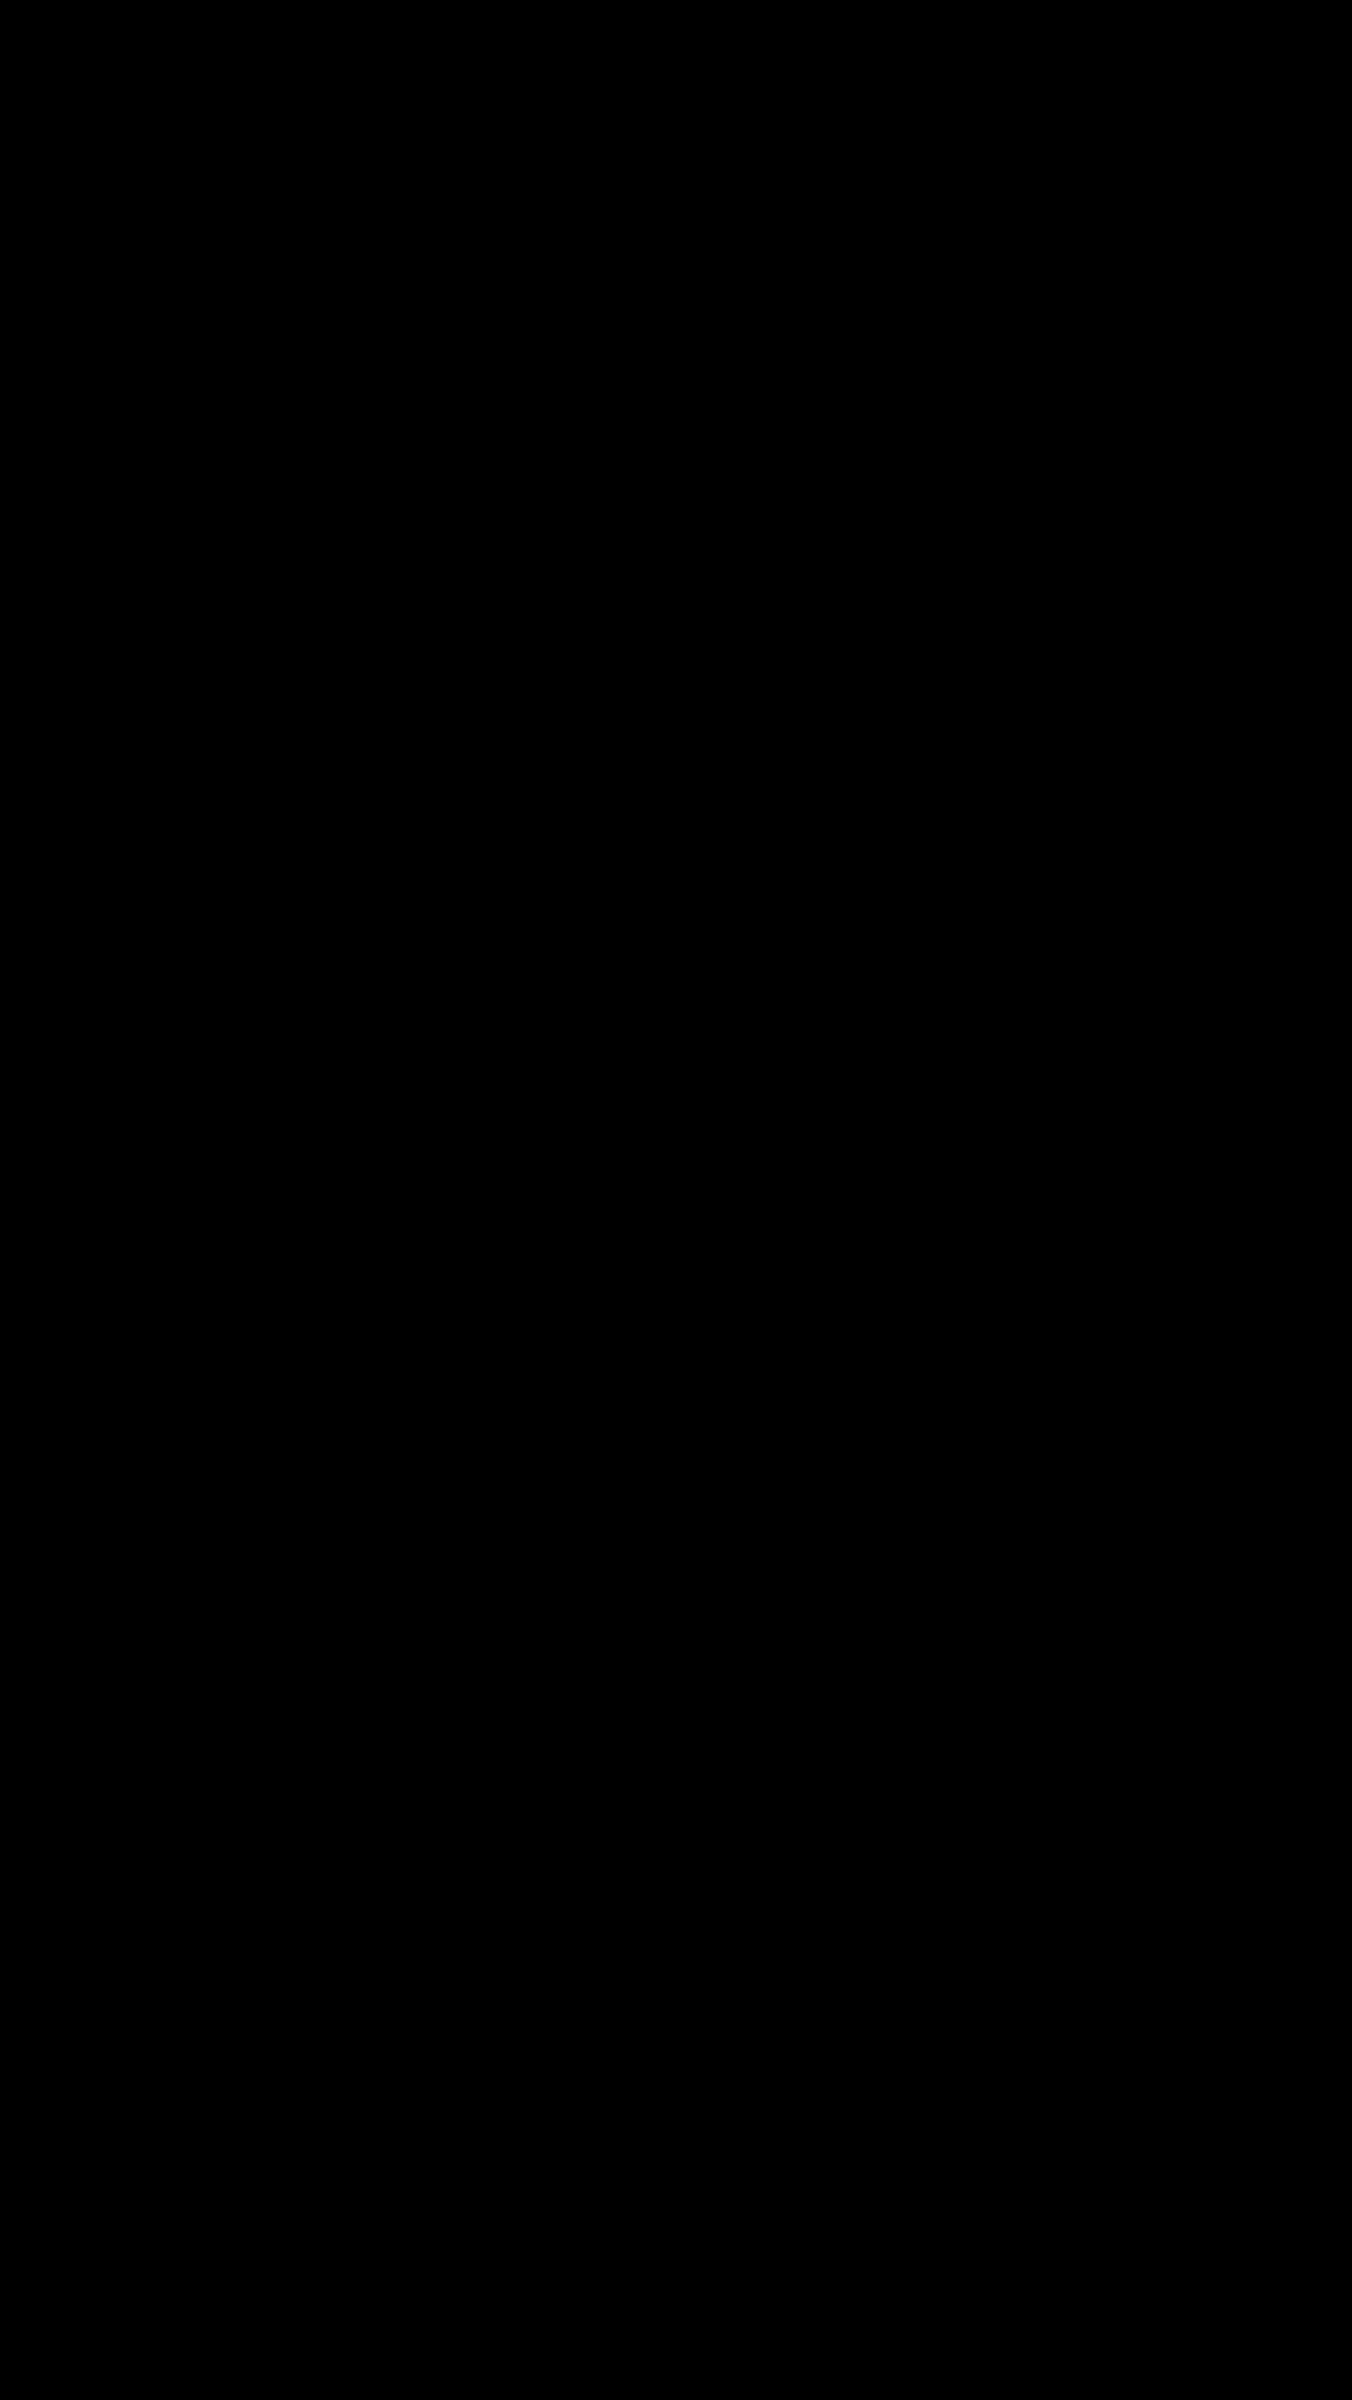 Cfl bulb clipart - Clipground